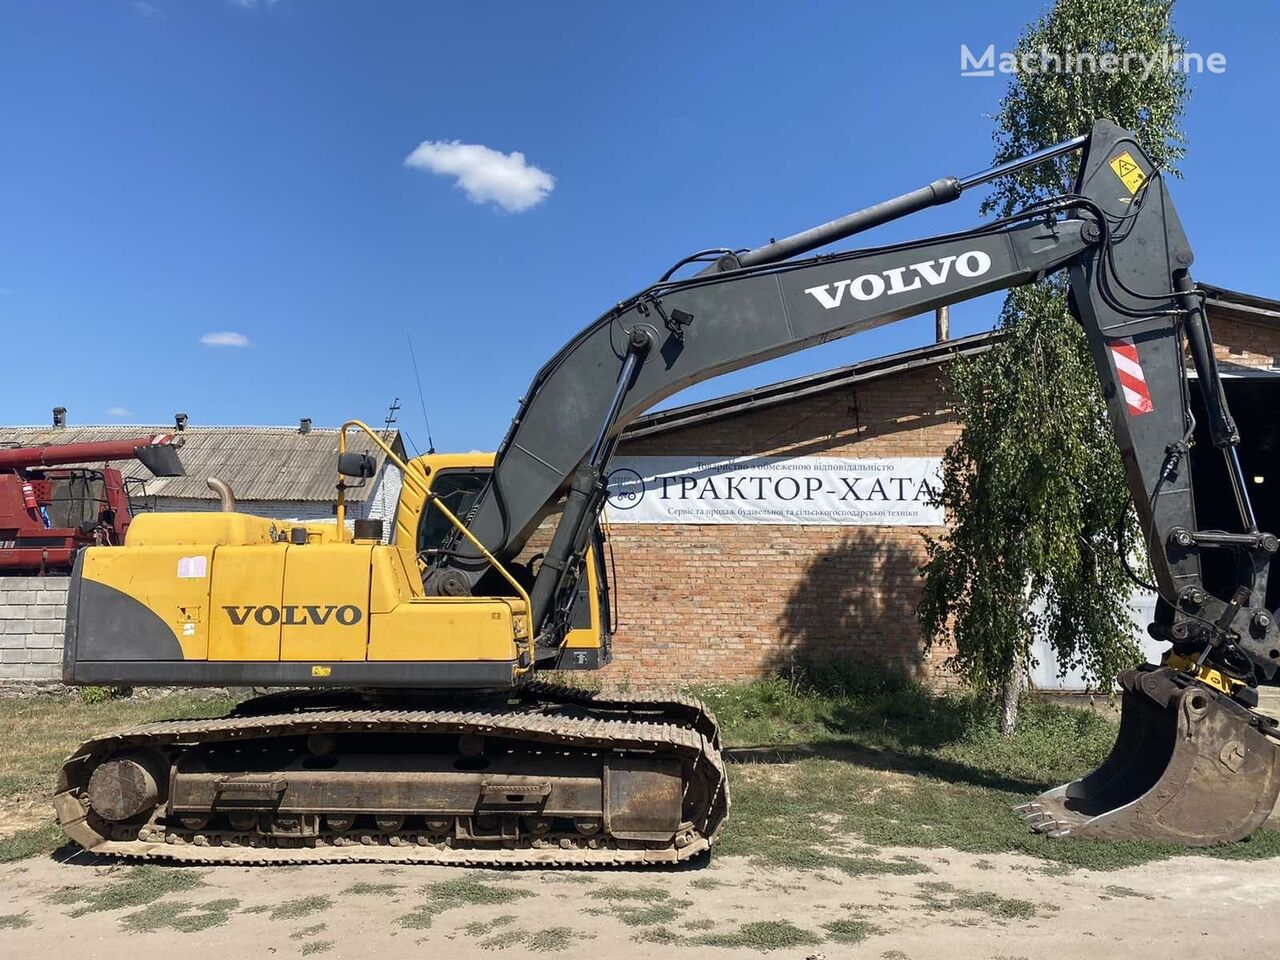 VOLVO EC 210 BLC  v Ukraine ( Ekskavator s Shvecii )  tracked excavator